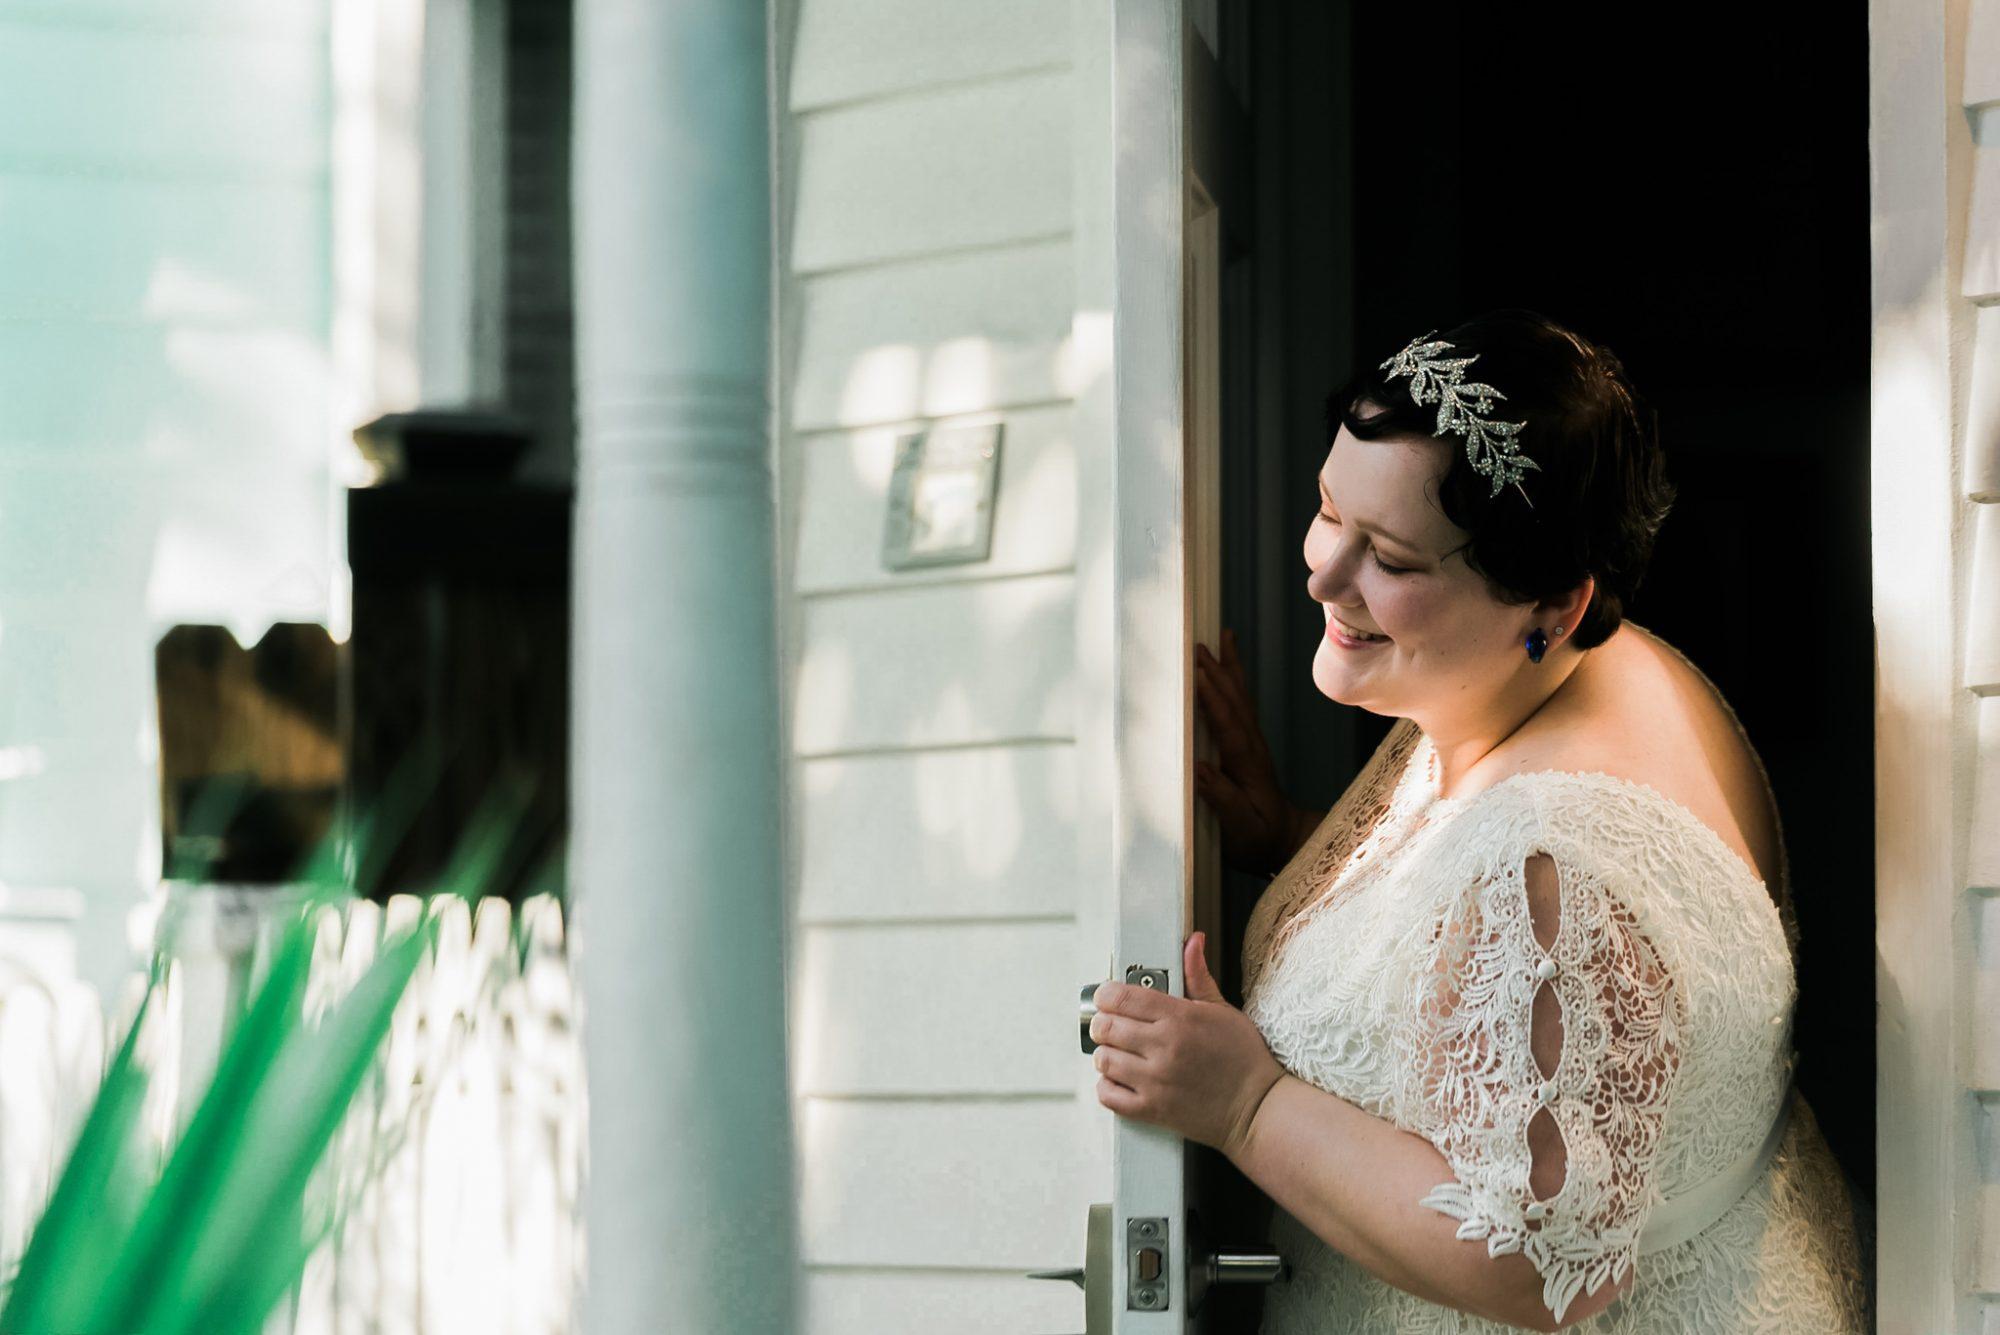 Becca and Leigh Hemingway Home Key West 50 - Becca & Leigh - Key West Wedding Photographer - Ernest Hemingway House